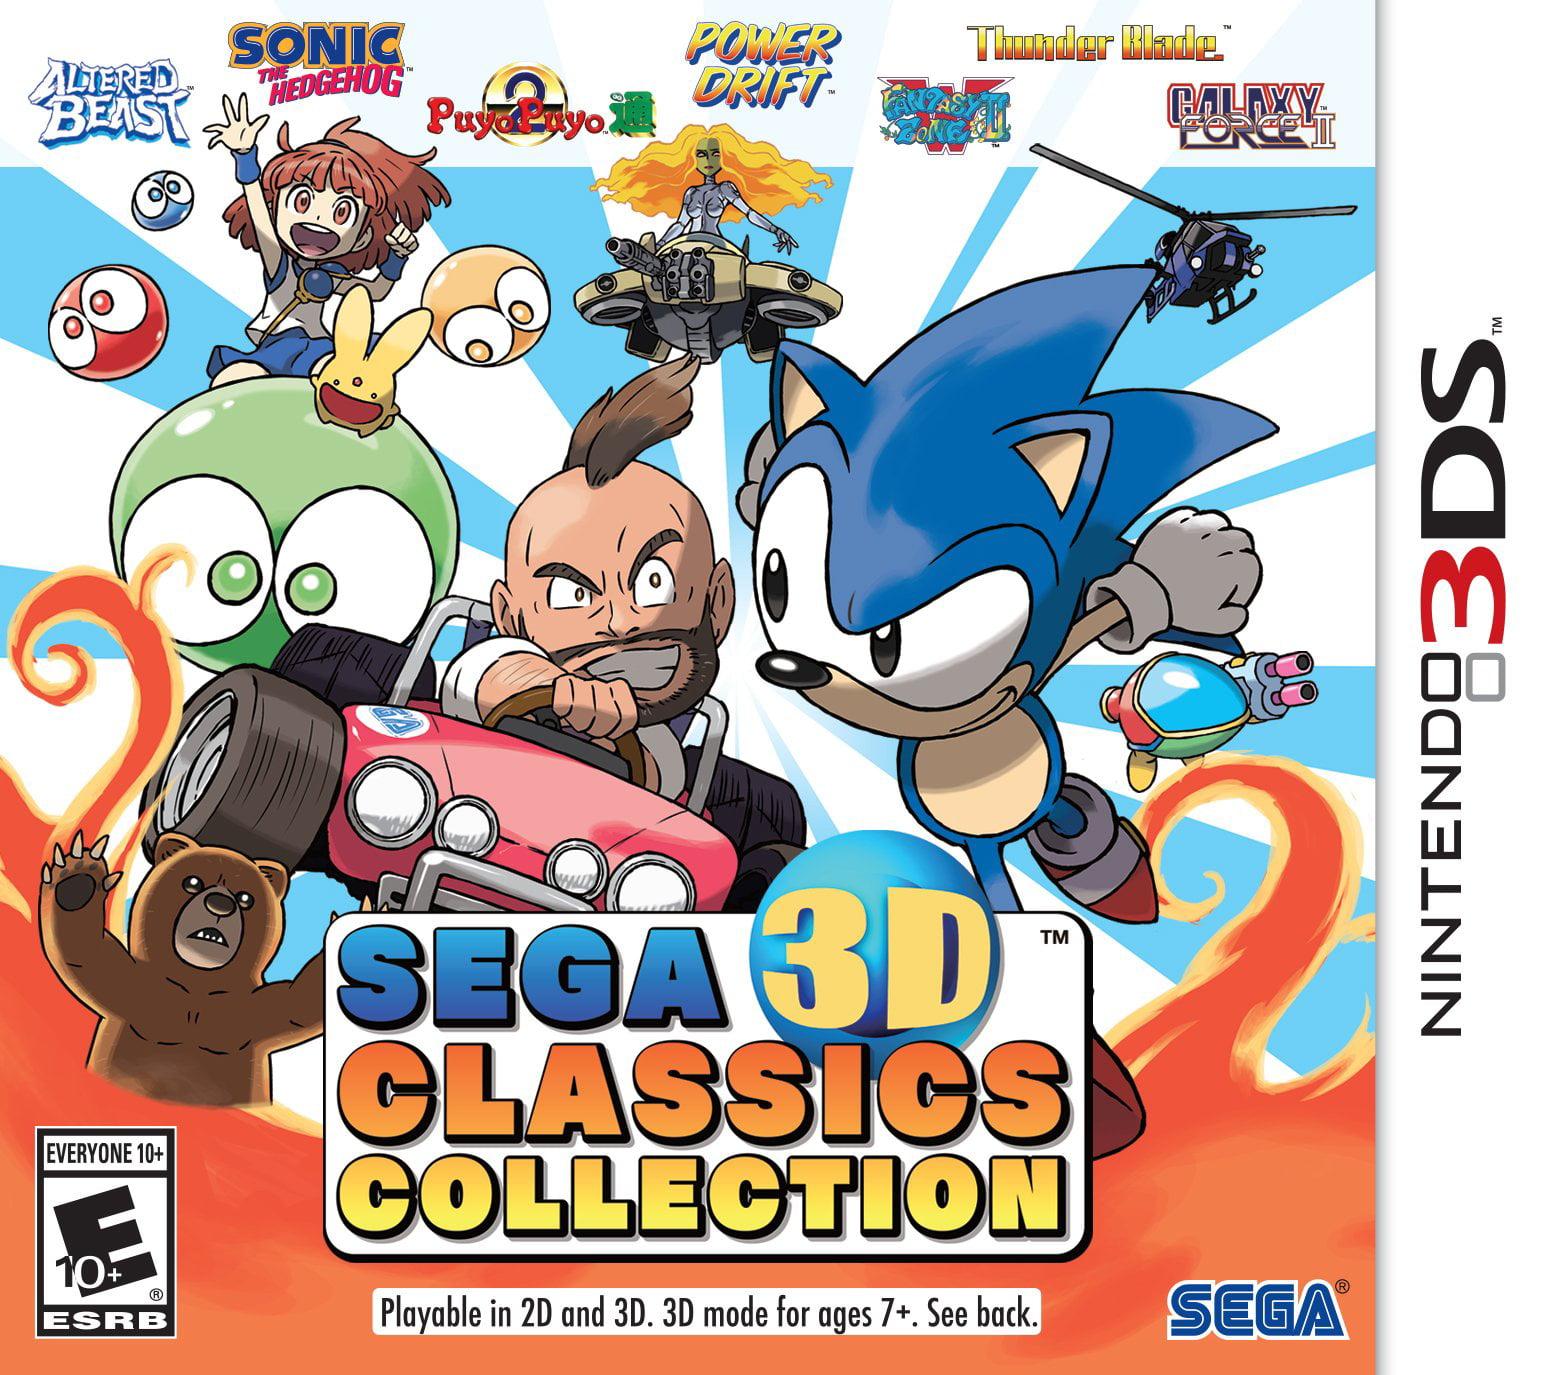 Sega 3d Classics Collection Action adventure Game Nintendo 3ds (cc-61120-5) by Sega